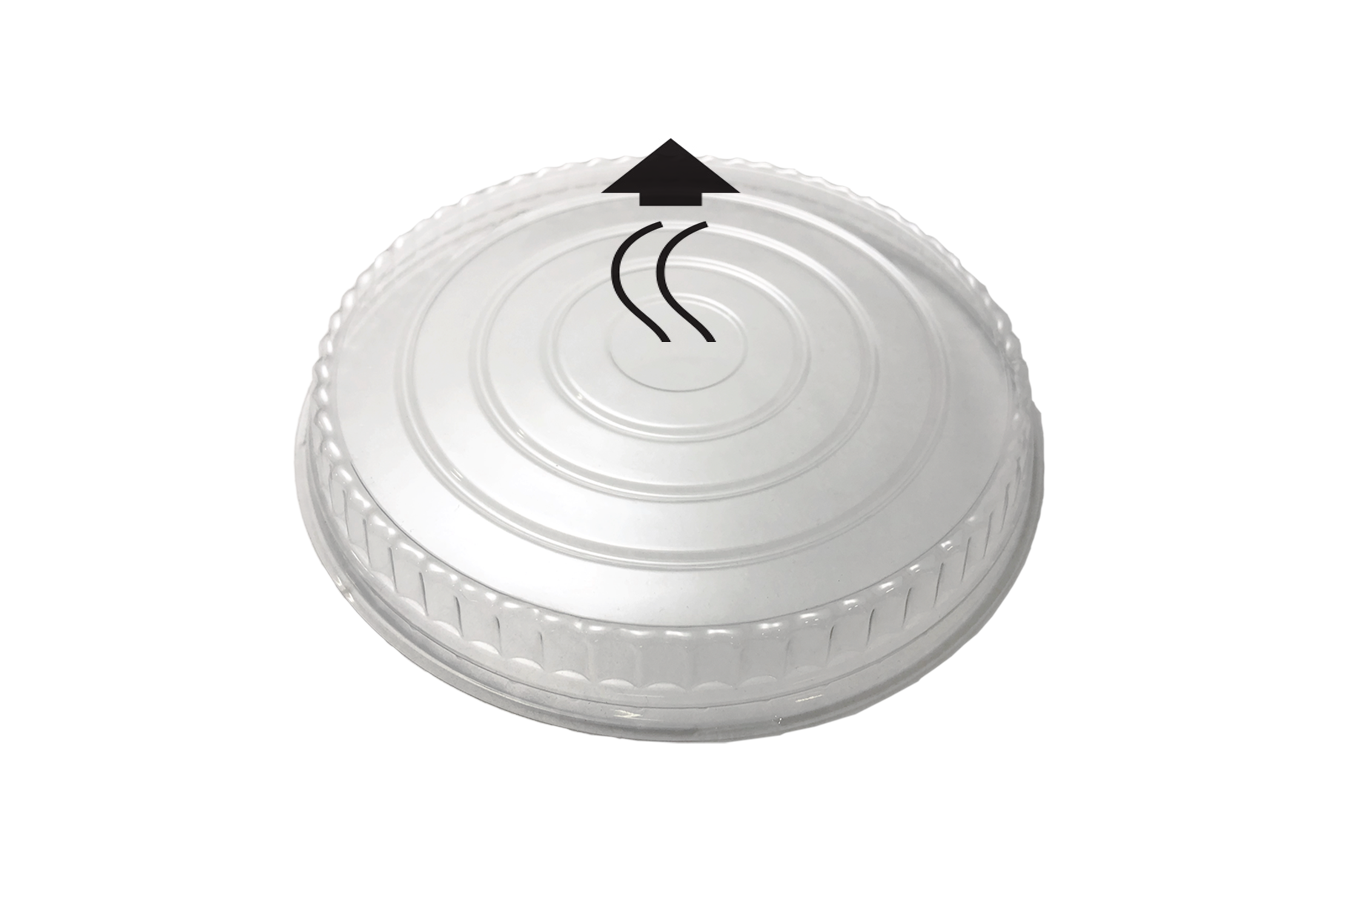 Line art illustration of clear transparent plastic vented OPS lid for Ecopax 24 oz Athena paper bowl